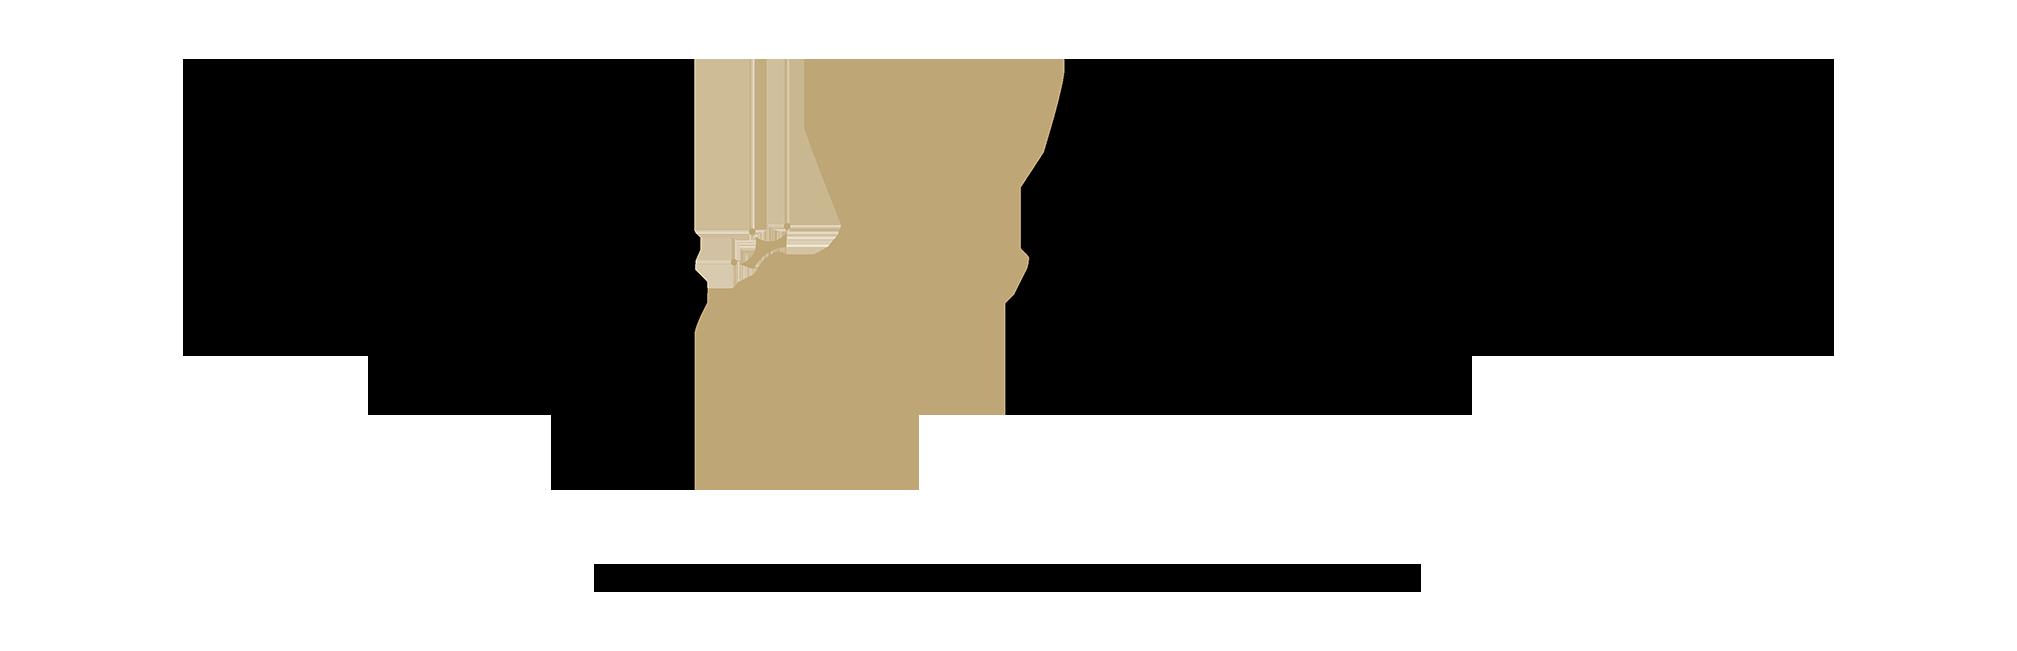 Koh Logo